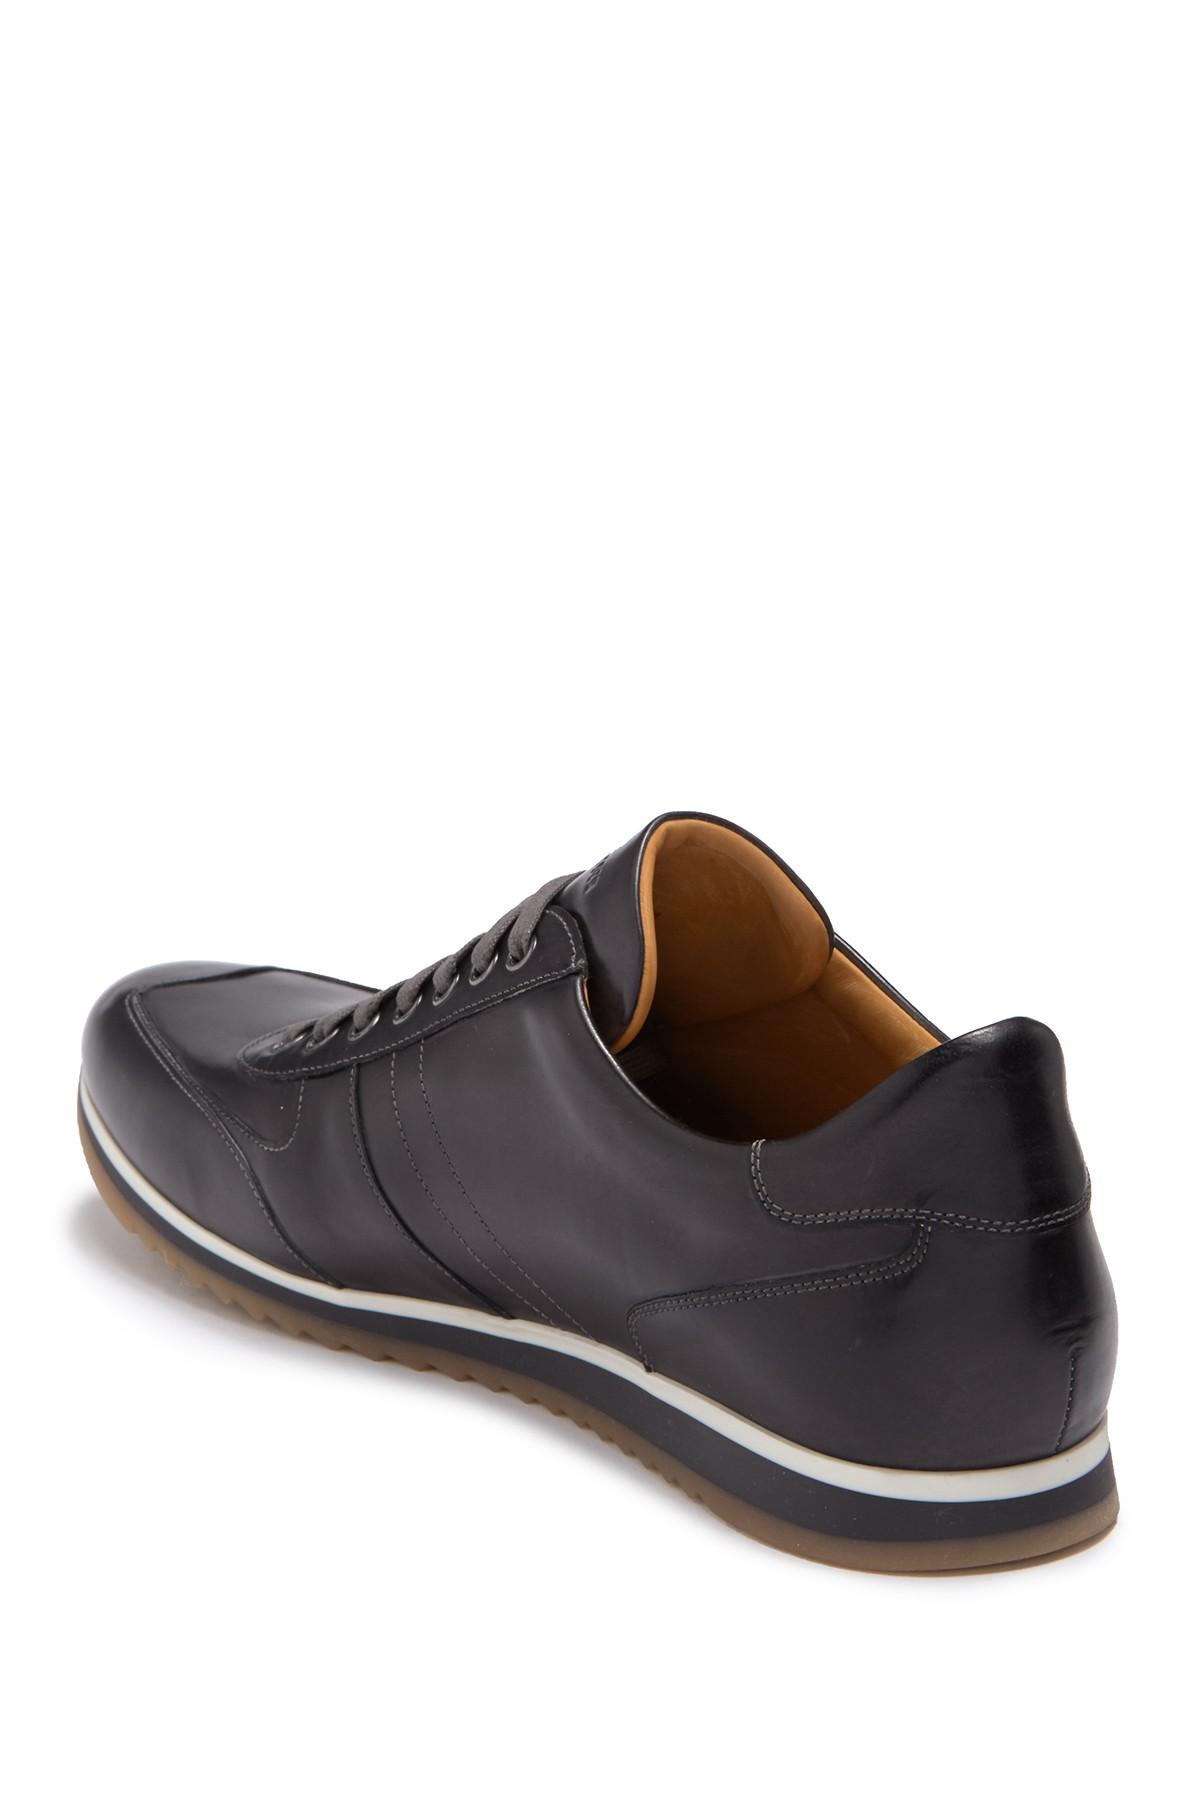 Magnanni Berkeley Leather Sneaker in